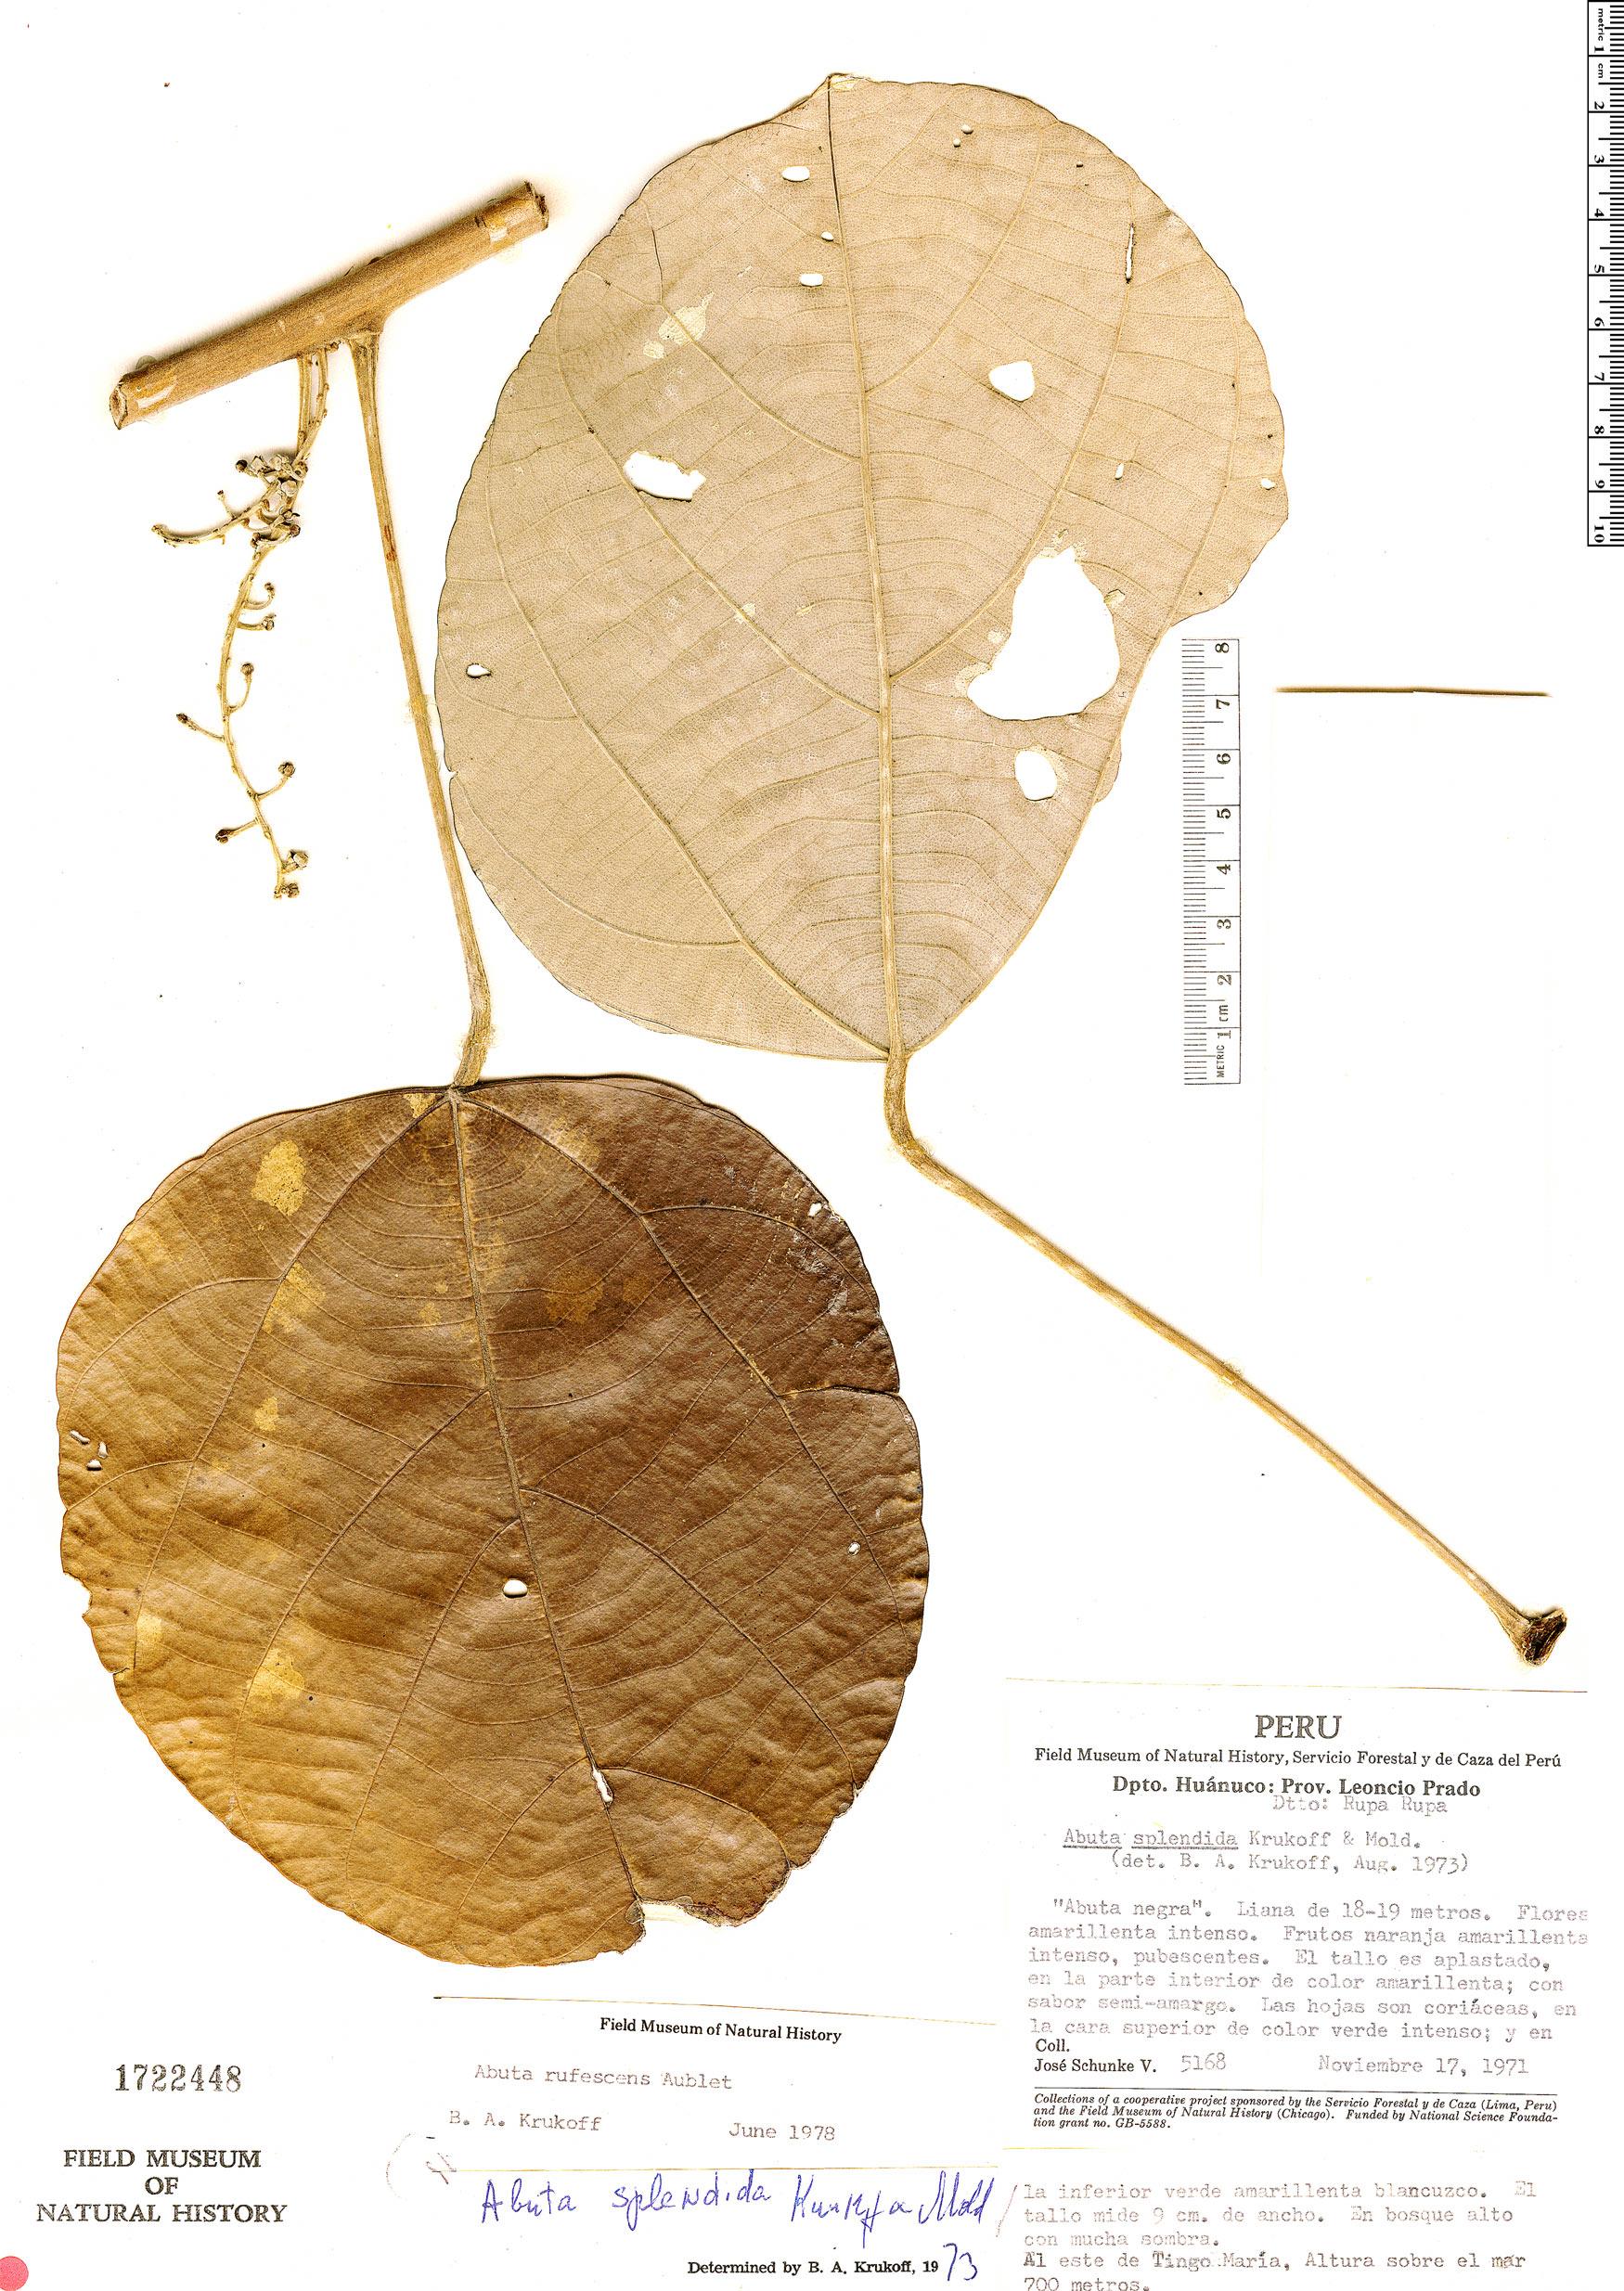 Espécime: Abuta rufescens